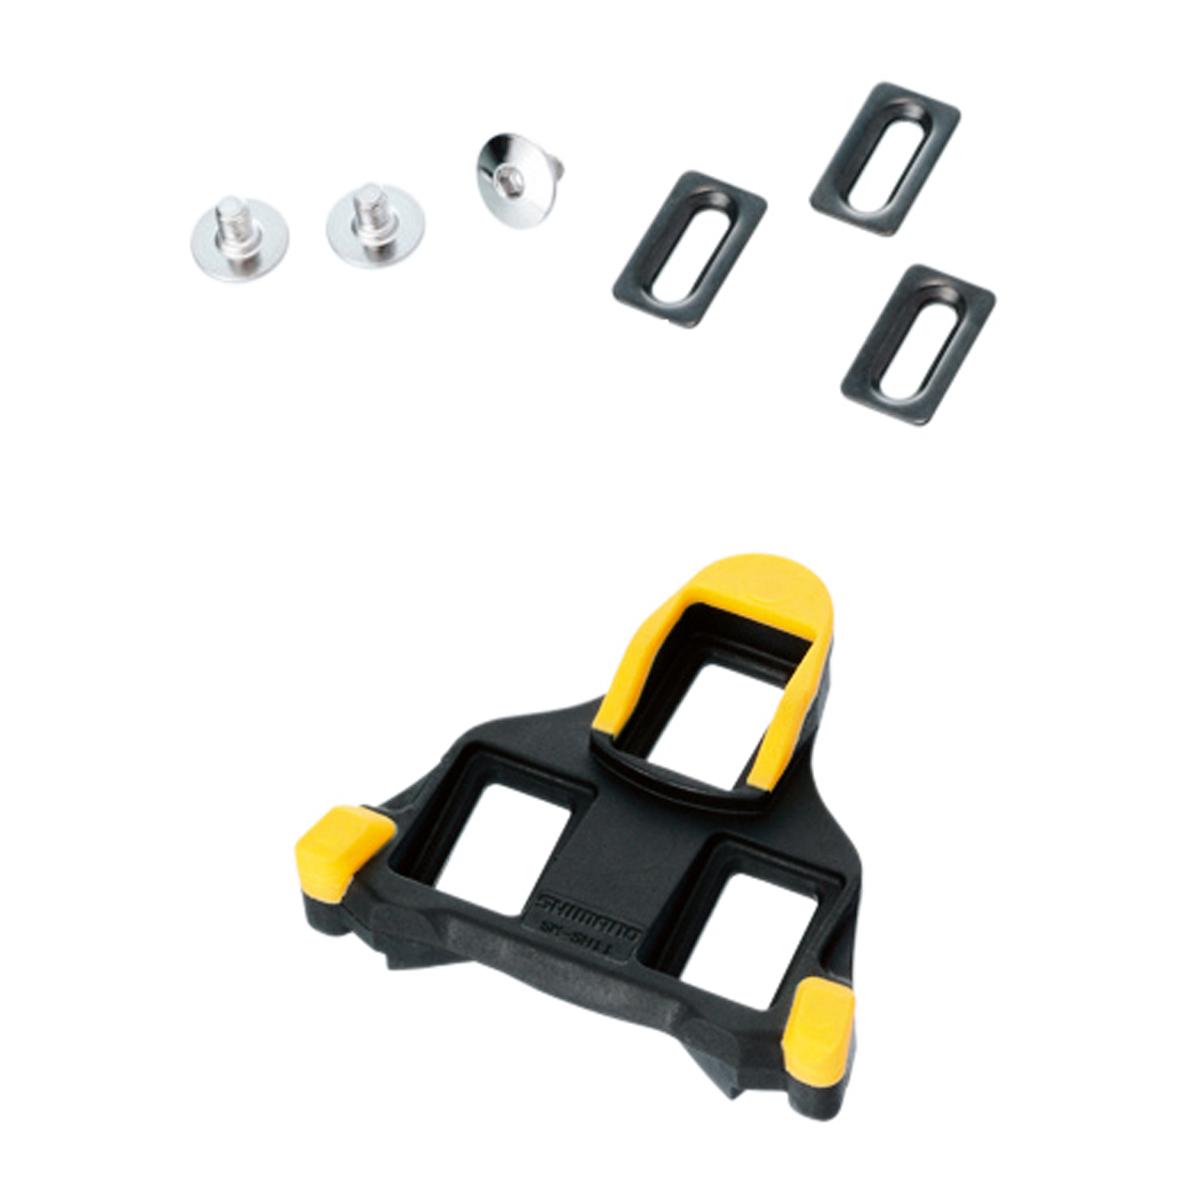 Shimano Bloki pedałów SM-SH11 SPD-SL Szosa, samoregulujace, żółte